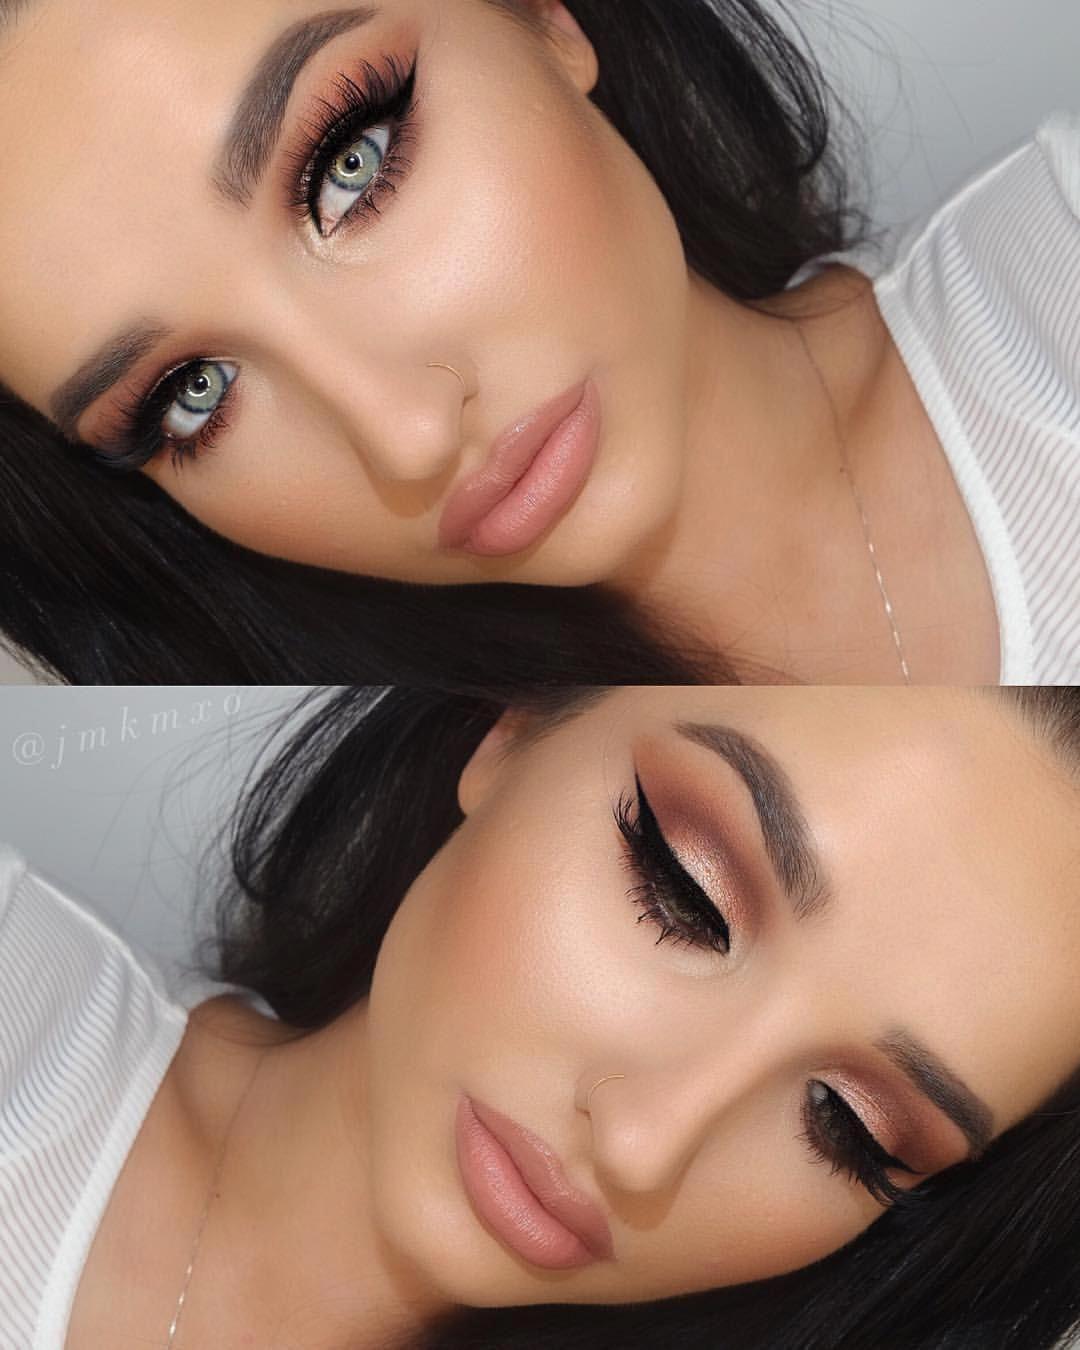 makeuplooksforbrowneyes Natural eye makeup, Attractive